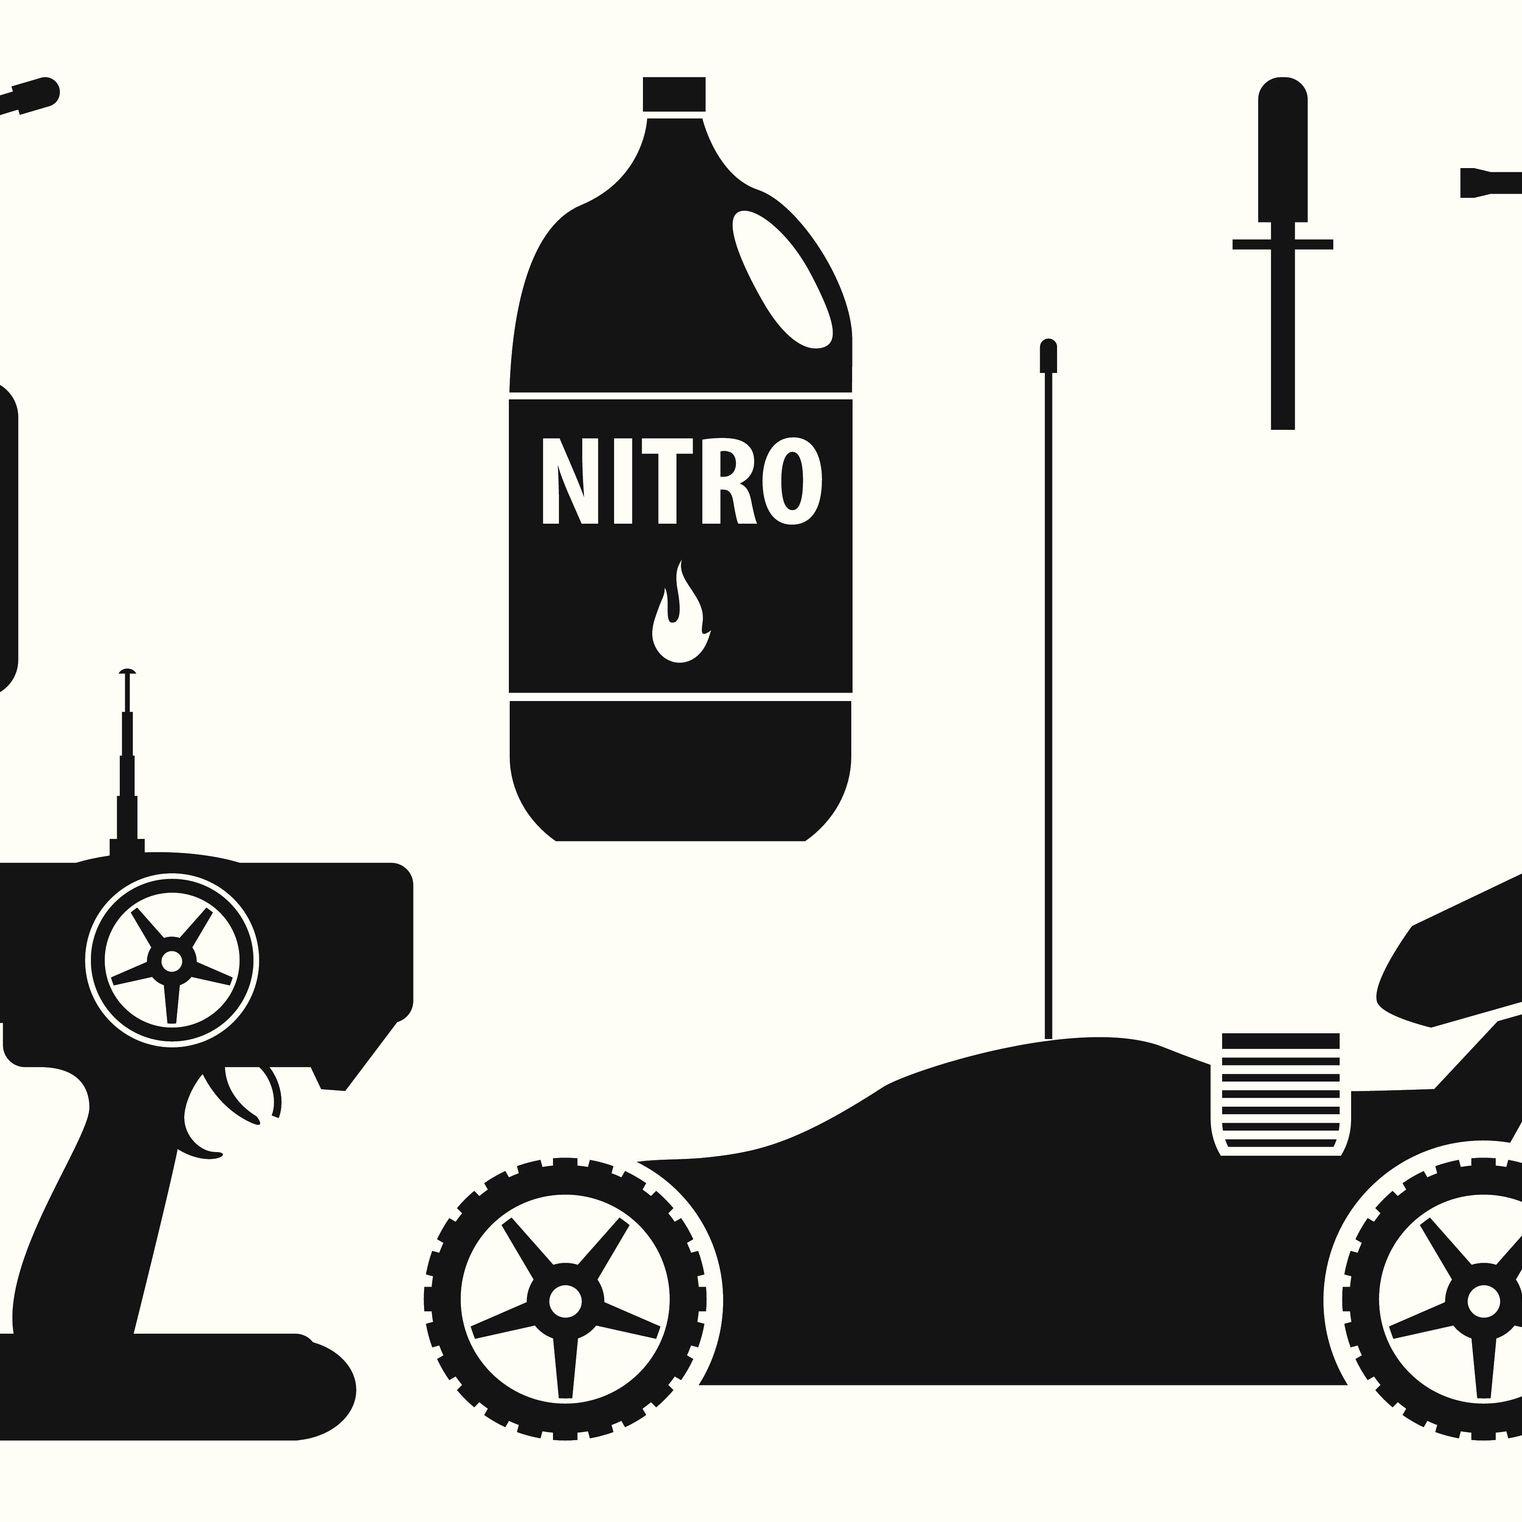 RC Vehicles: Nitro Fuel Percentage Differences